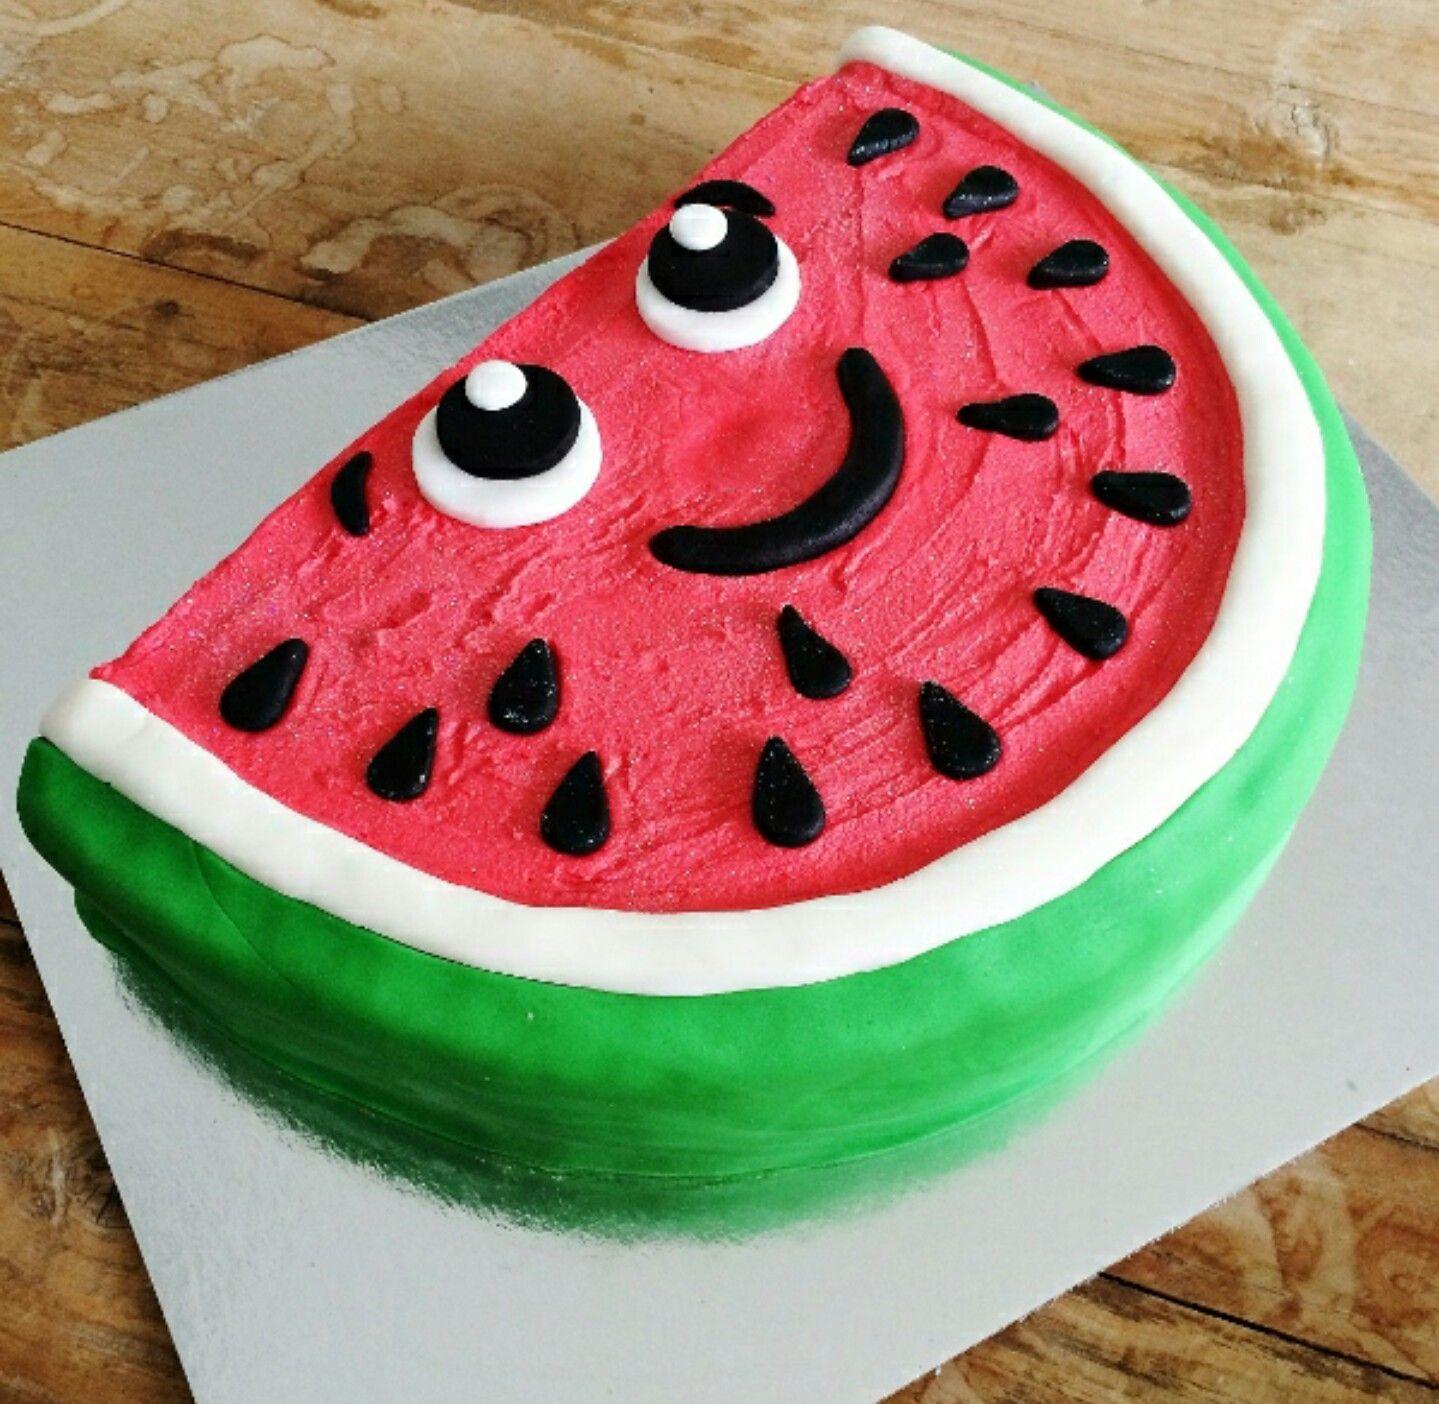 Watermelon smiling face cake | Water+melon... Watermelon ...